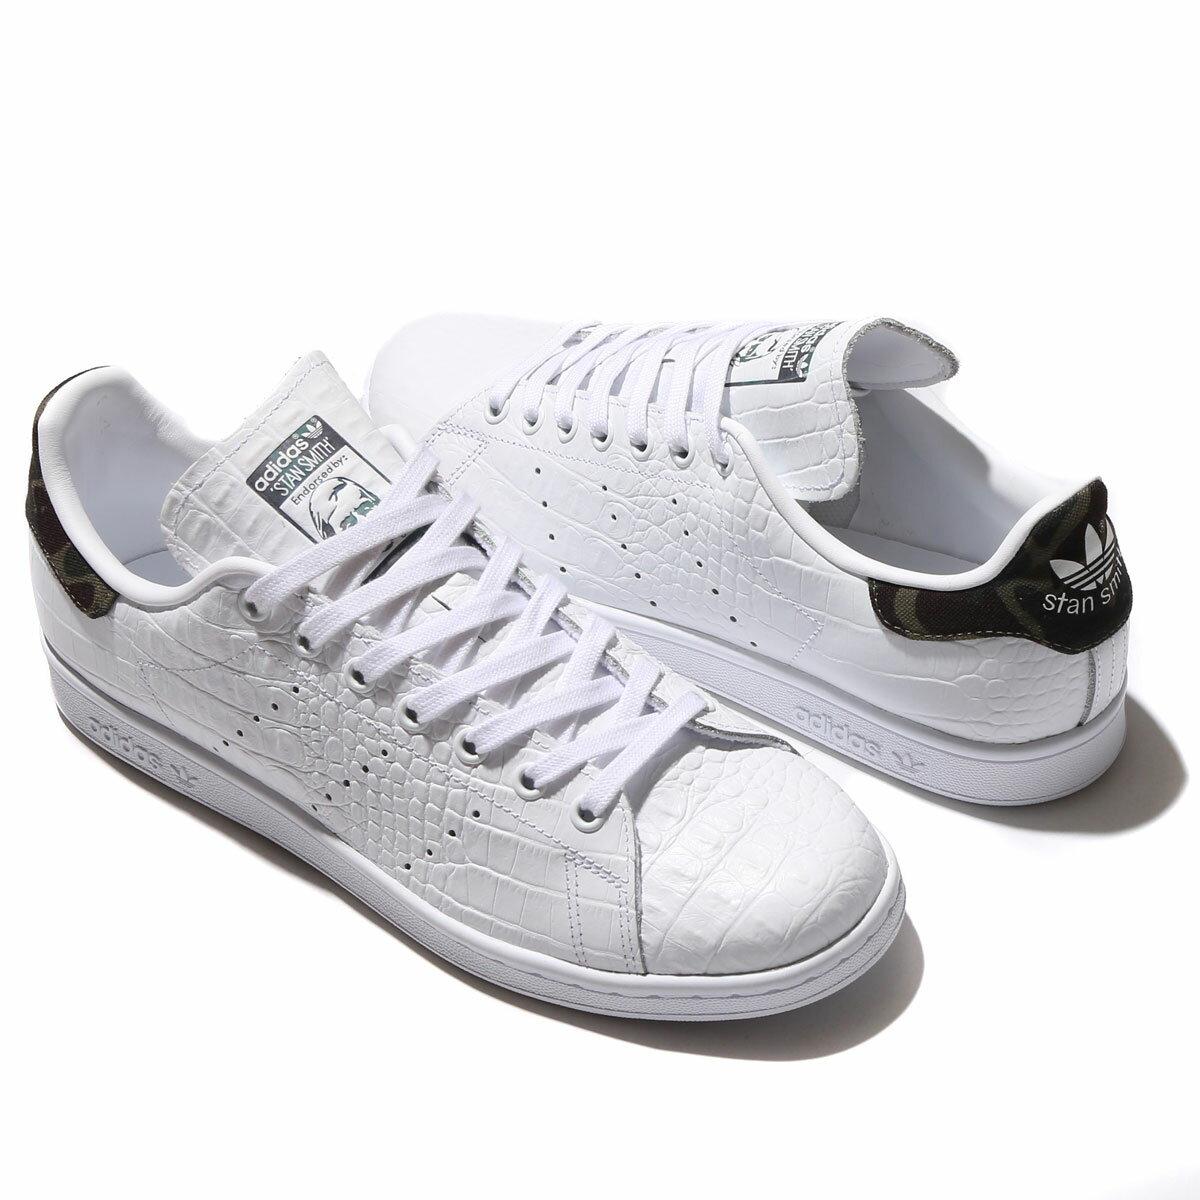 adidas Originals STAN SMITH(アディダス オリジナルス スタン スミス)WHITE/CORE BLACK【メンズ レディース スニーカー】17SS-I